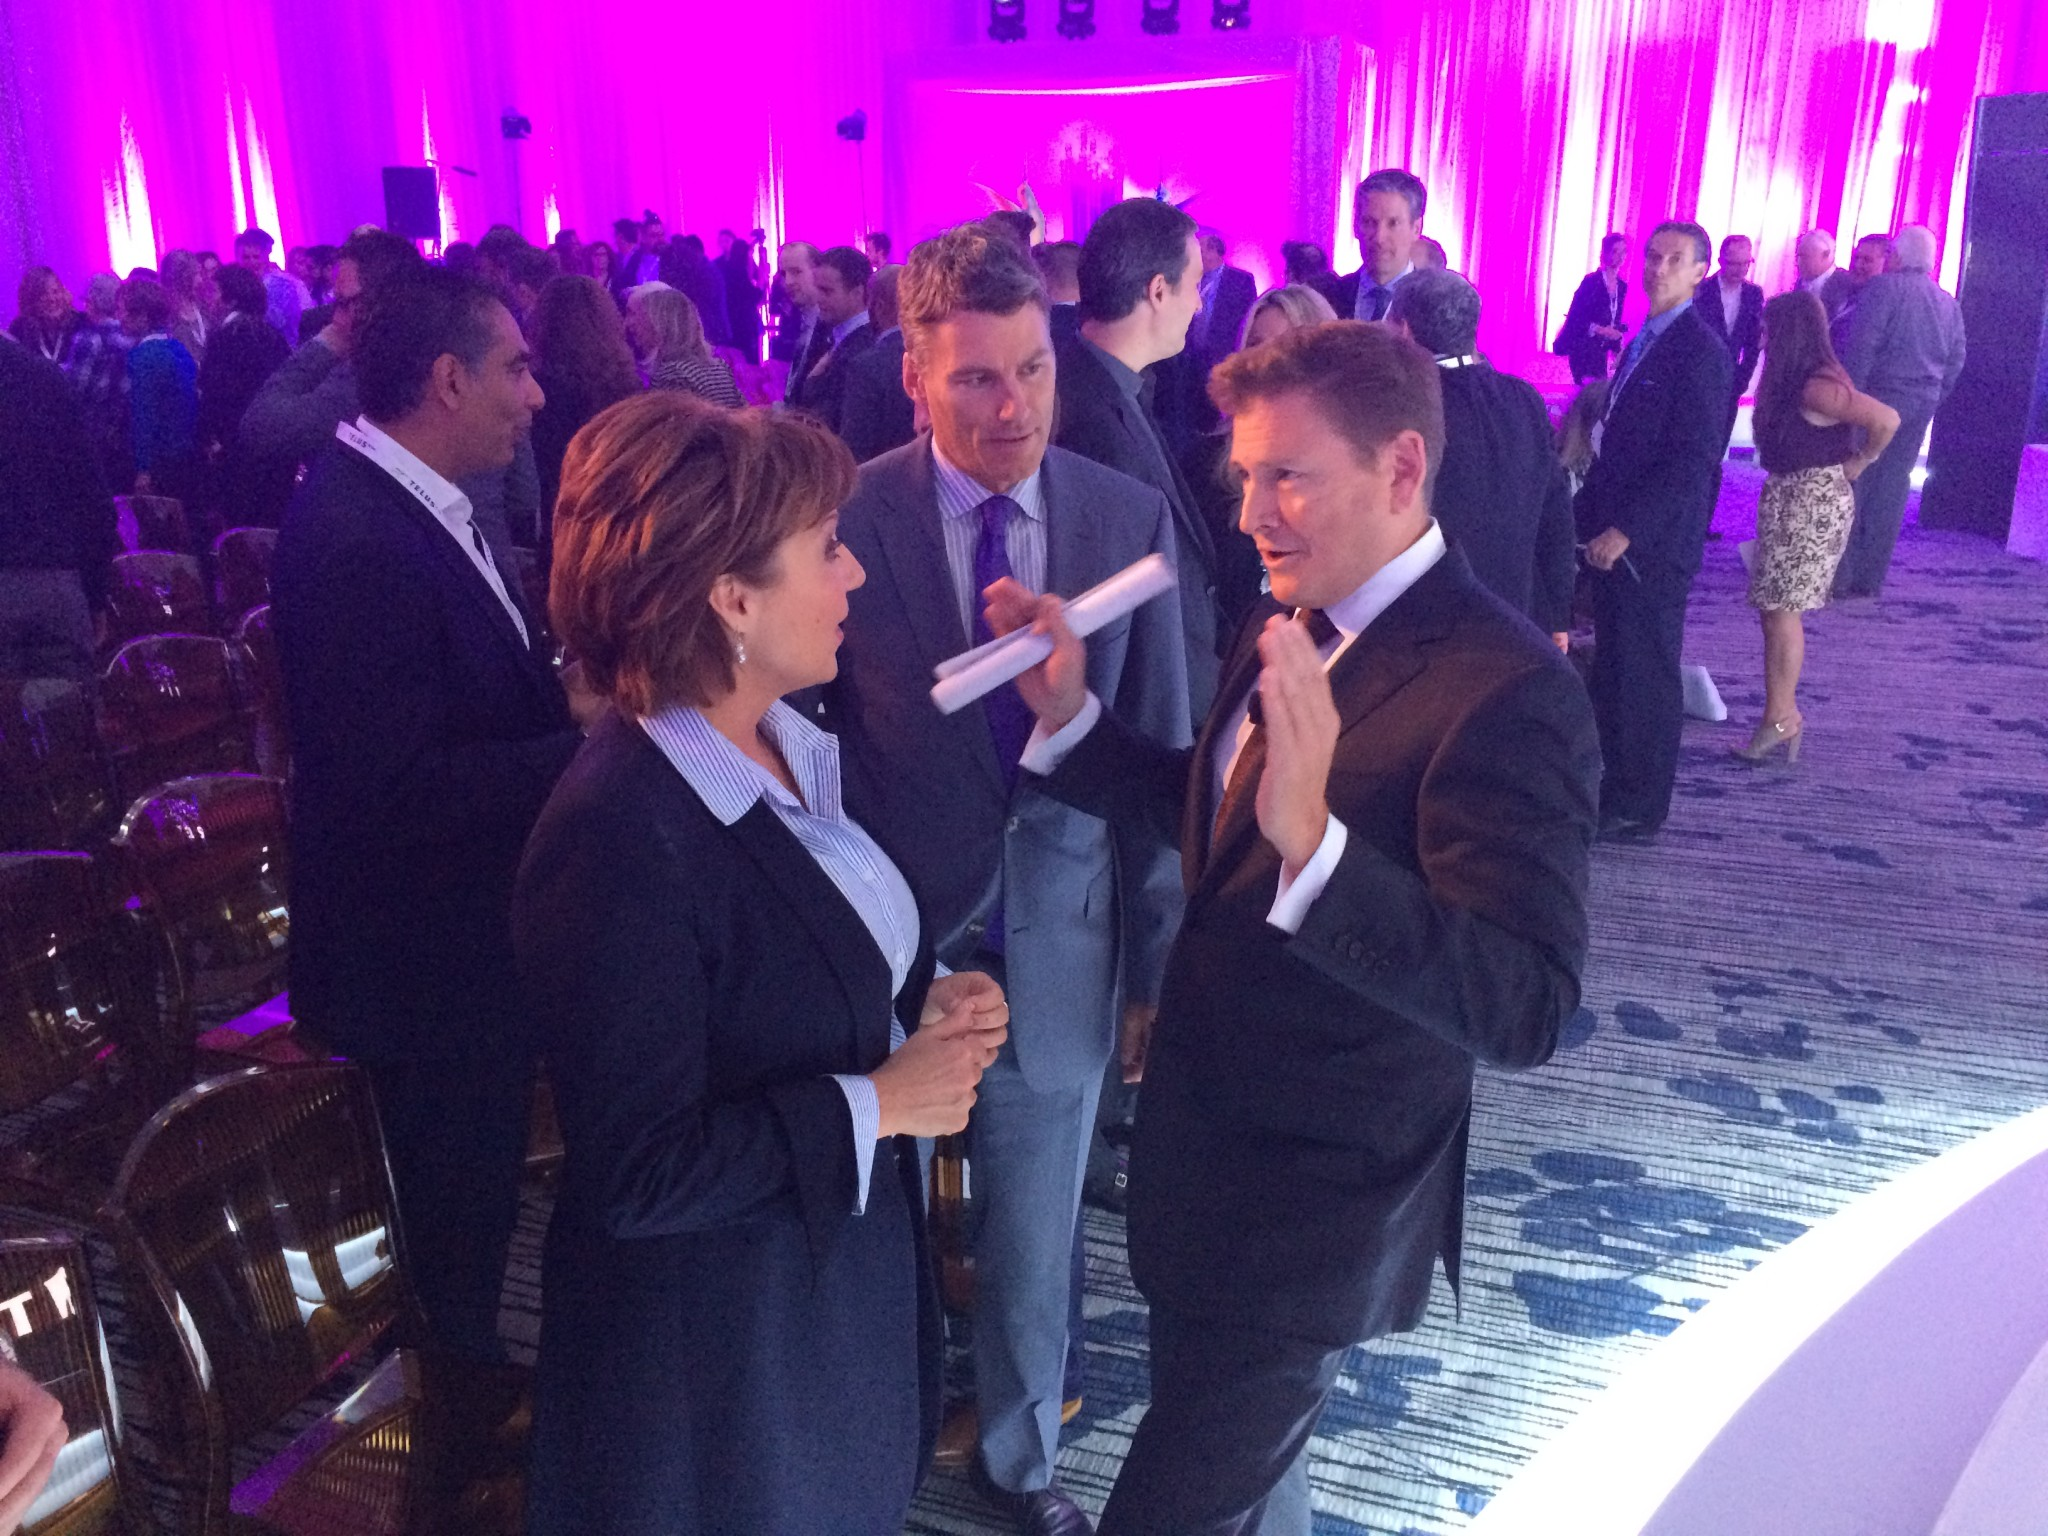 Premier Christy Clark, Mayor Gregor Robertson and TELUS CEO Darren Entwistle discuss the project; Image: Jill Slattery / Vancity Buzz